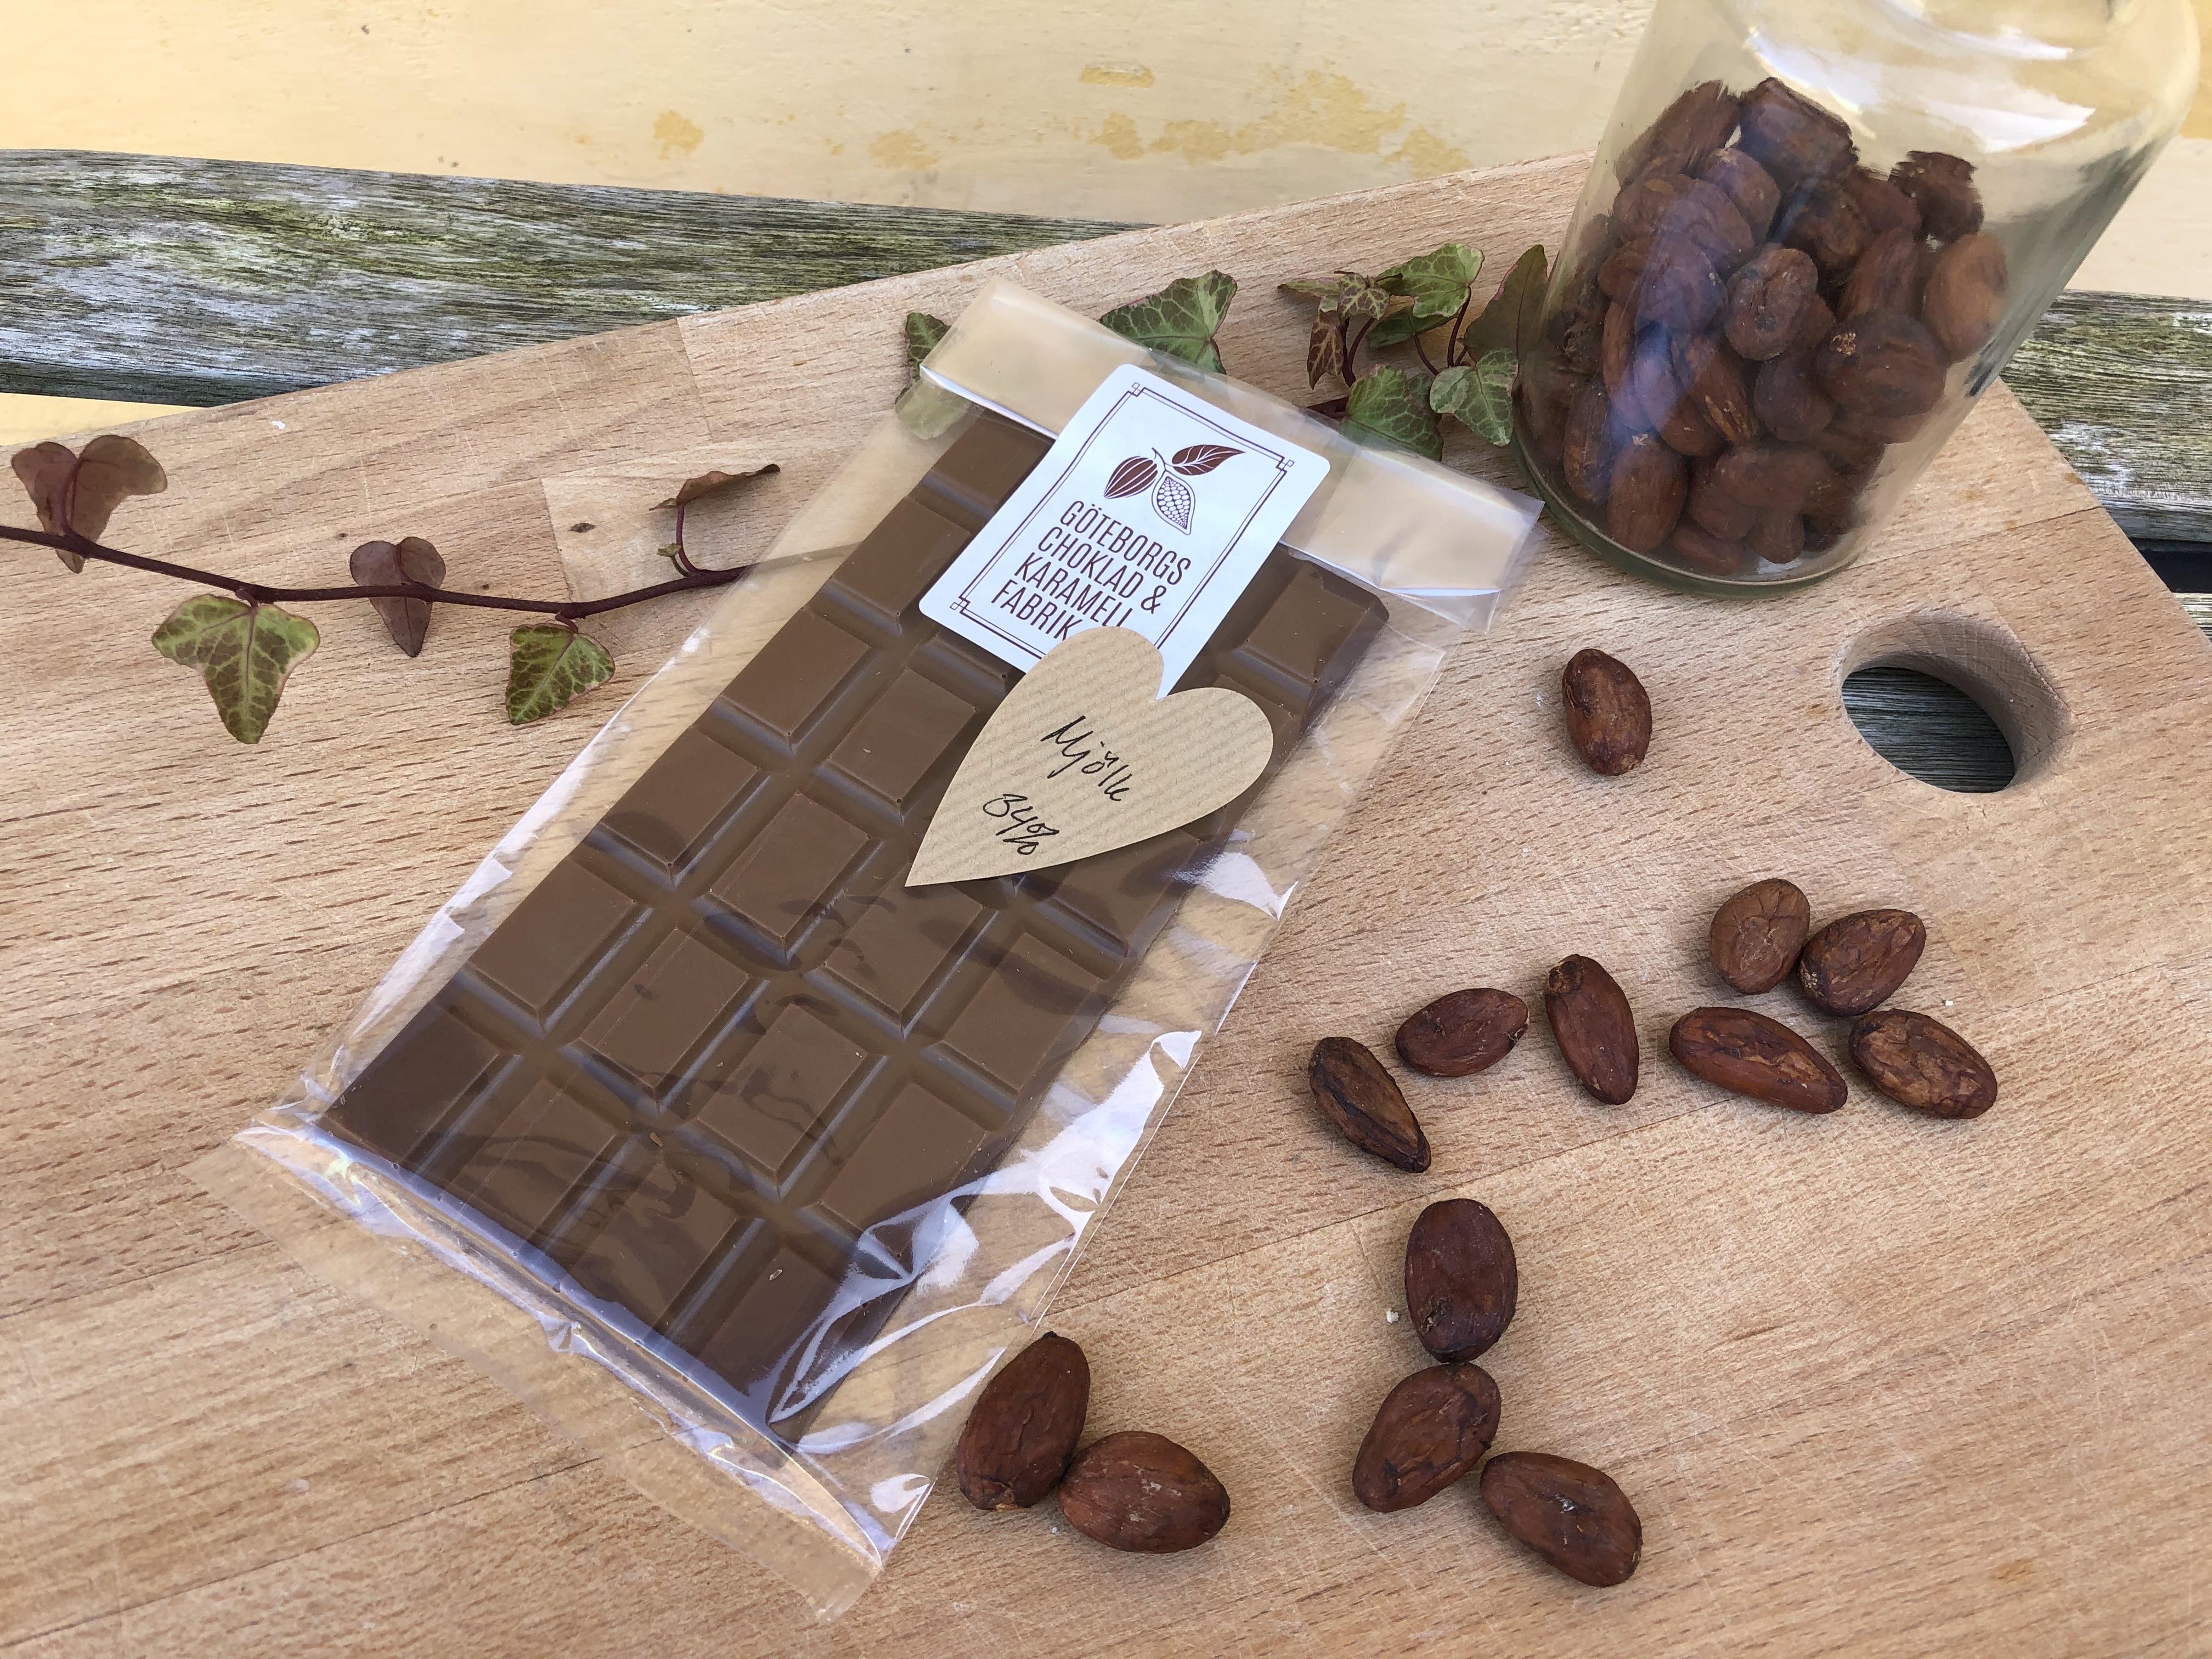 Våra egna chokladkakor